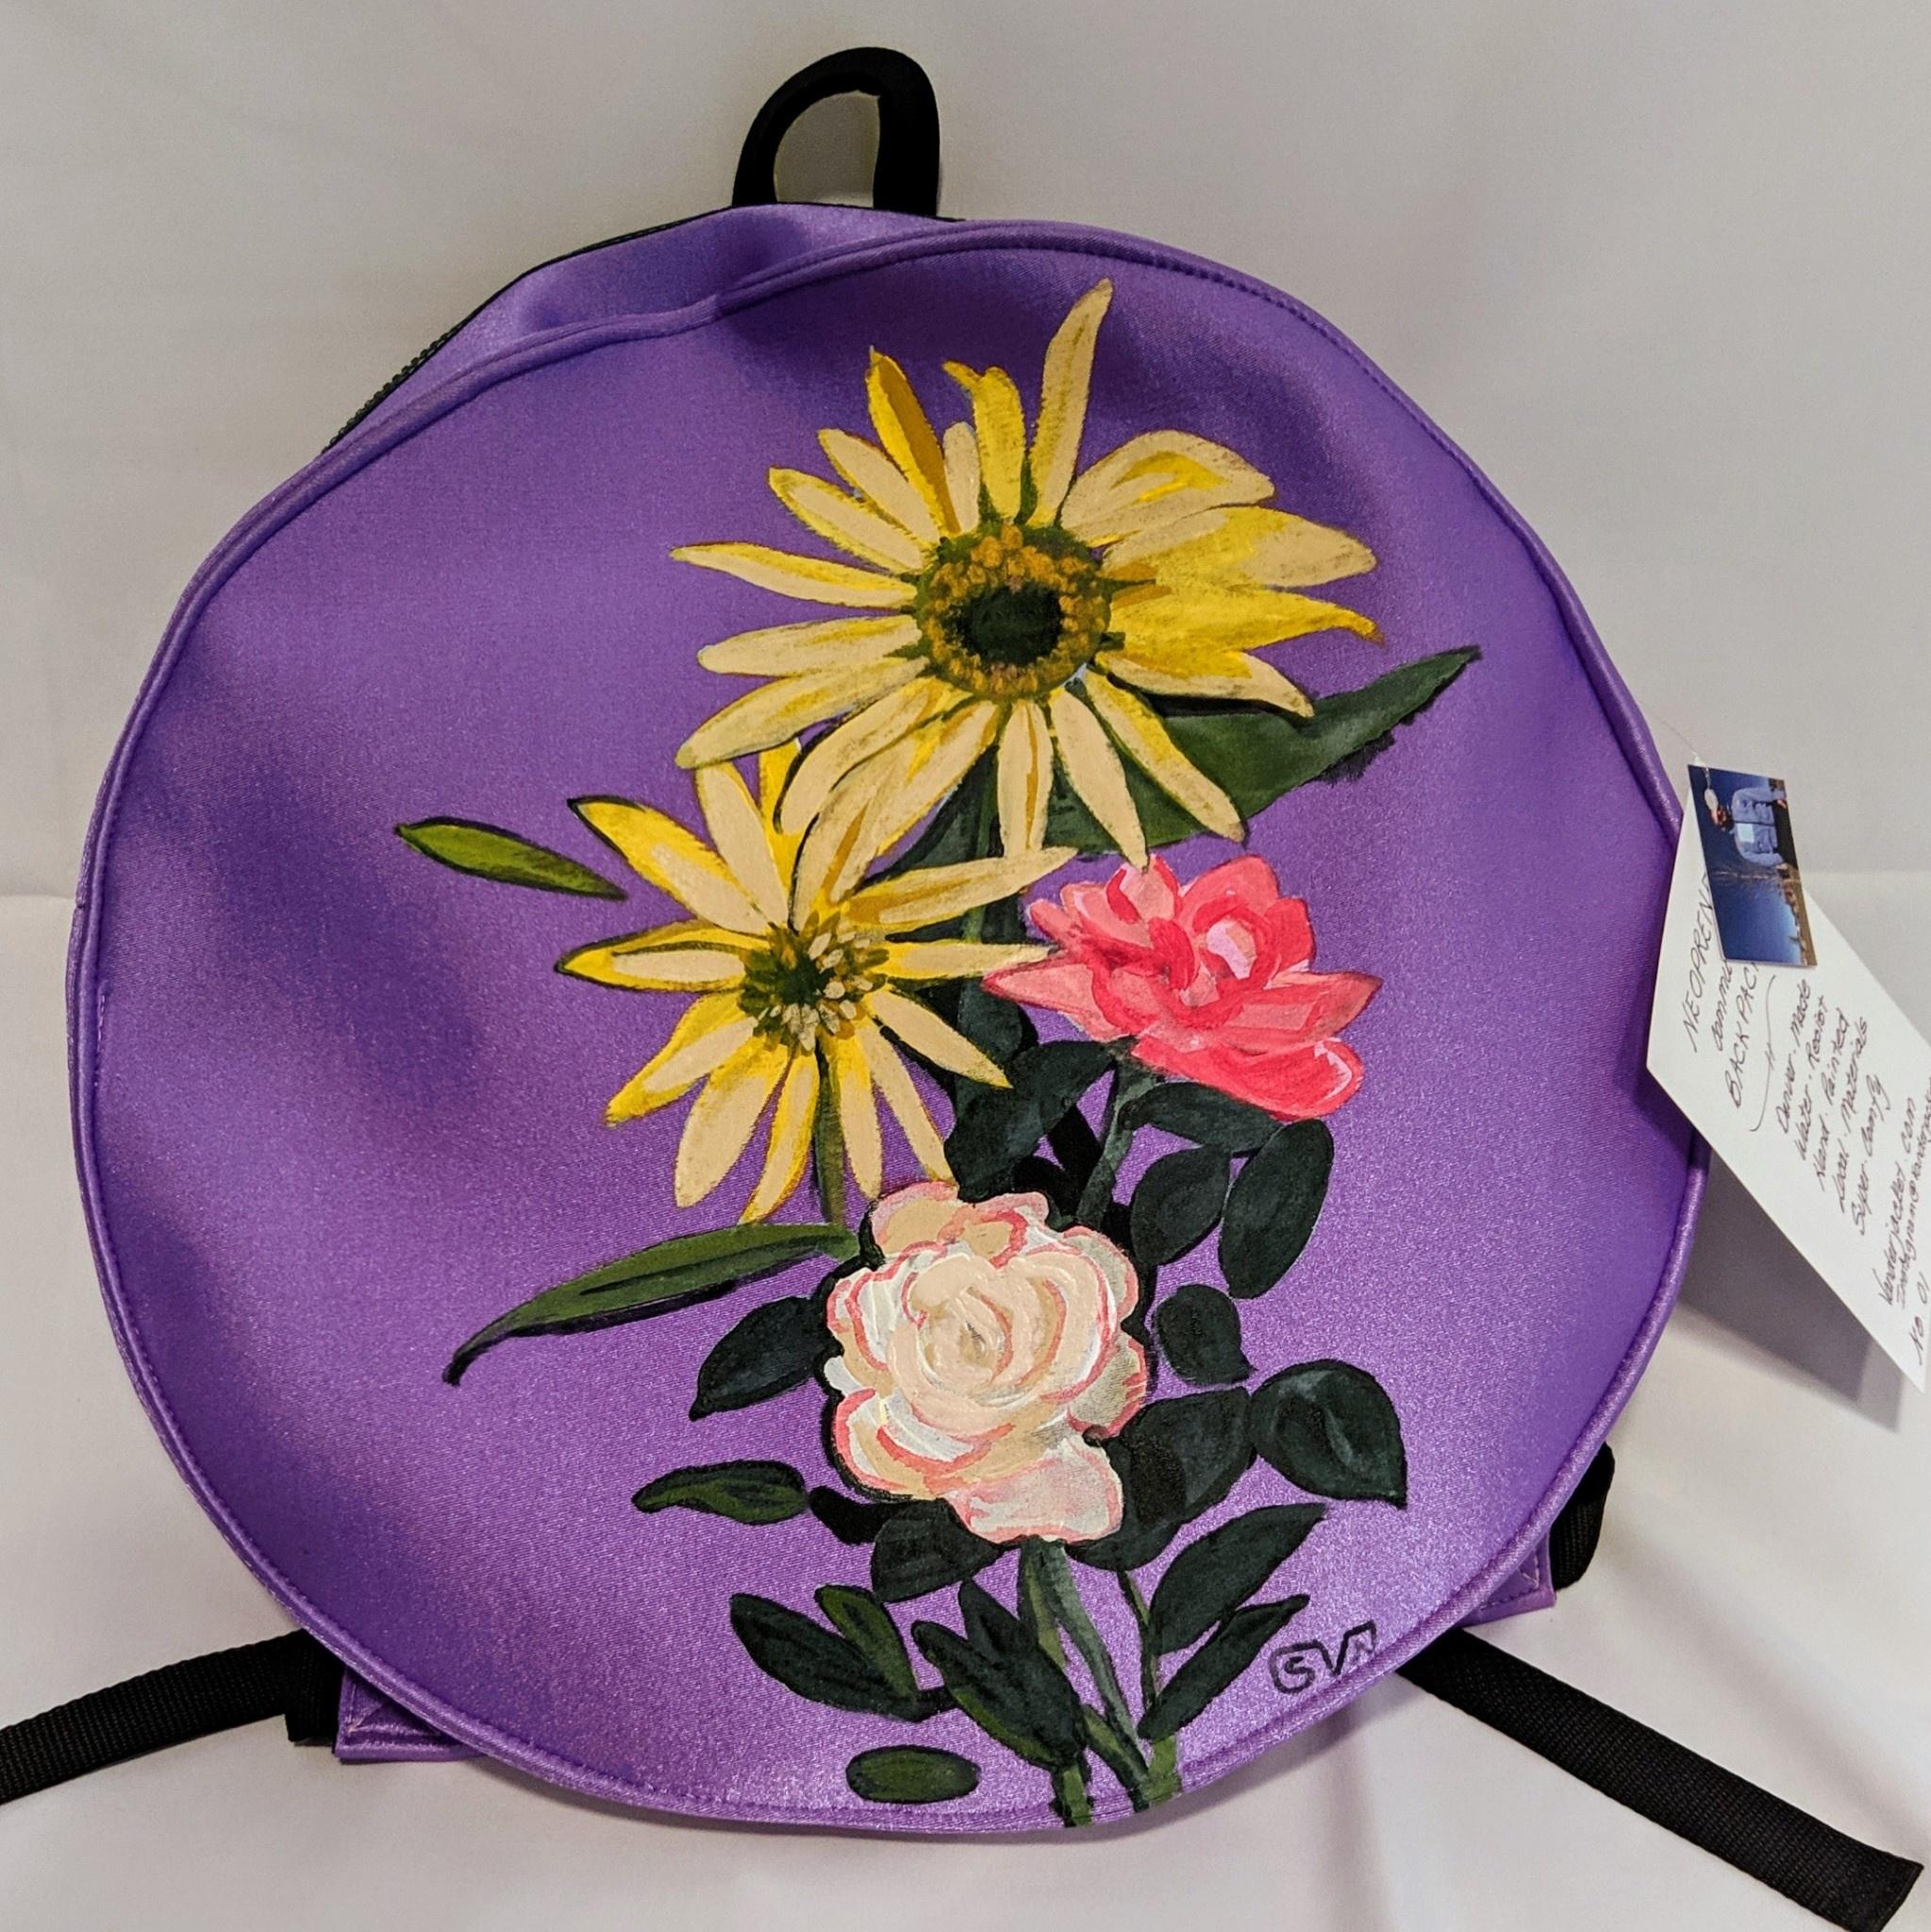 Sarah Vanderneut Neoprene Backpack Purple - Hand Painted Floral Design